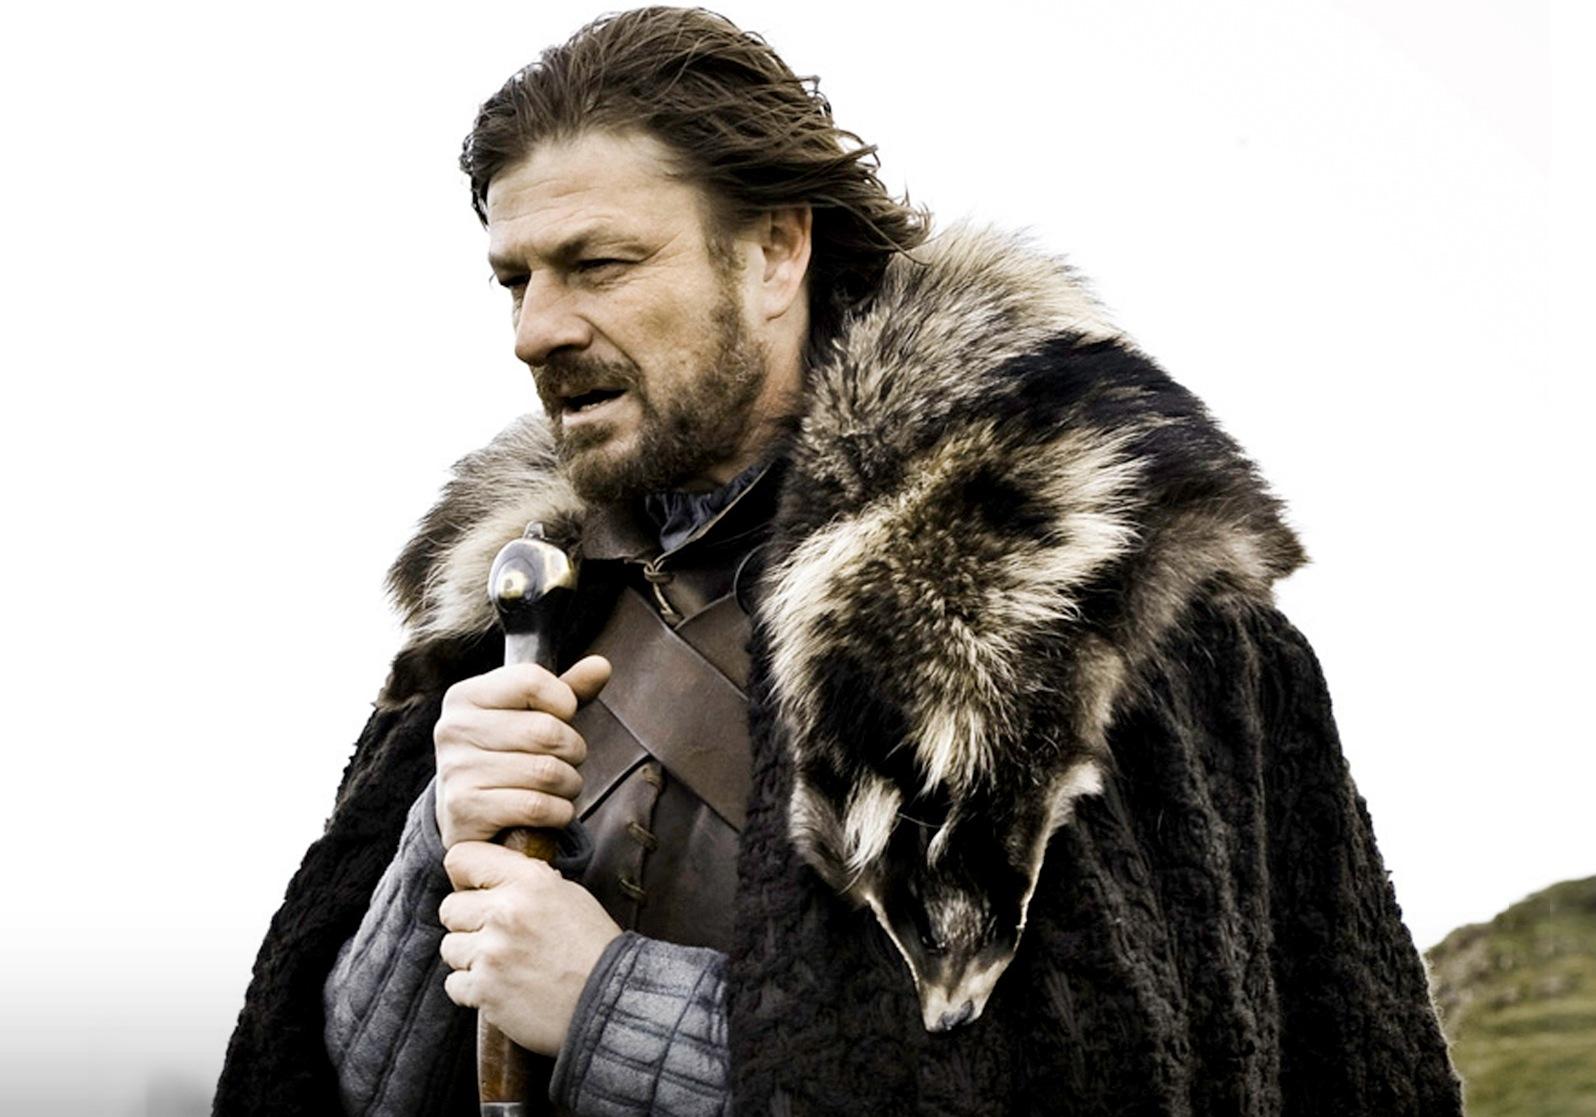 Sean-Bean-Eddard-Stark.jpg